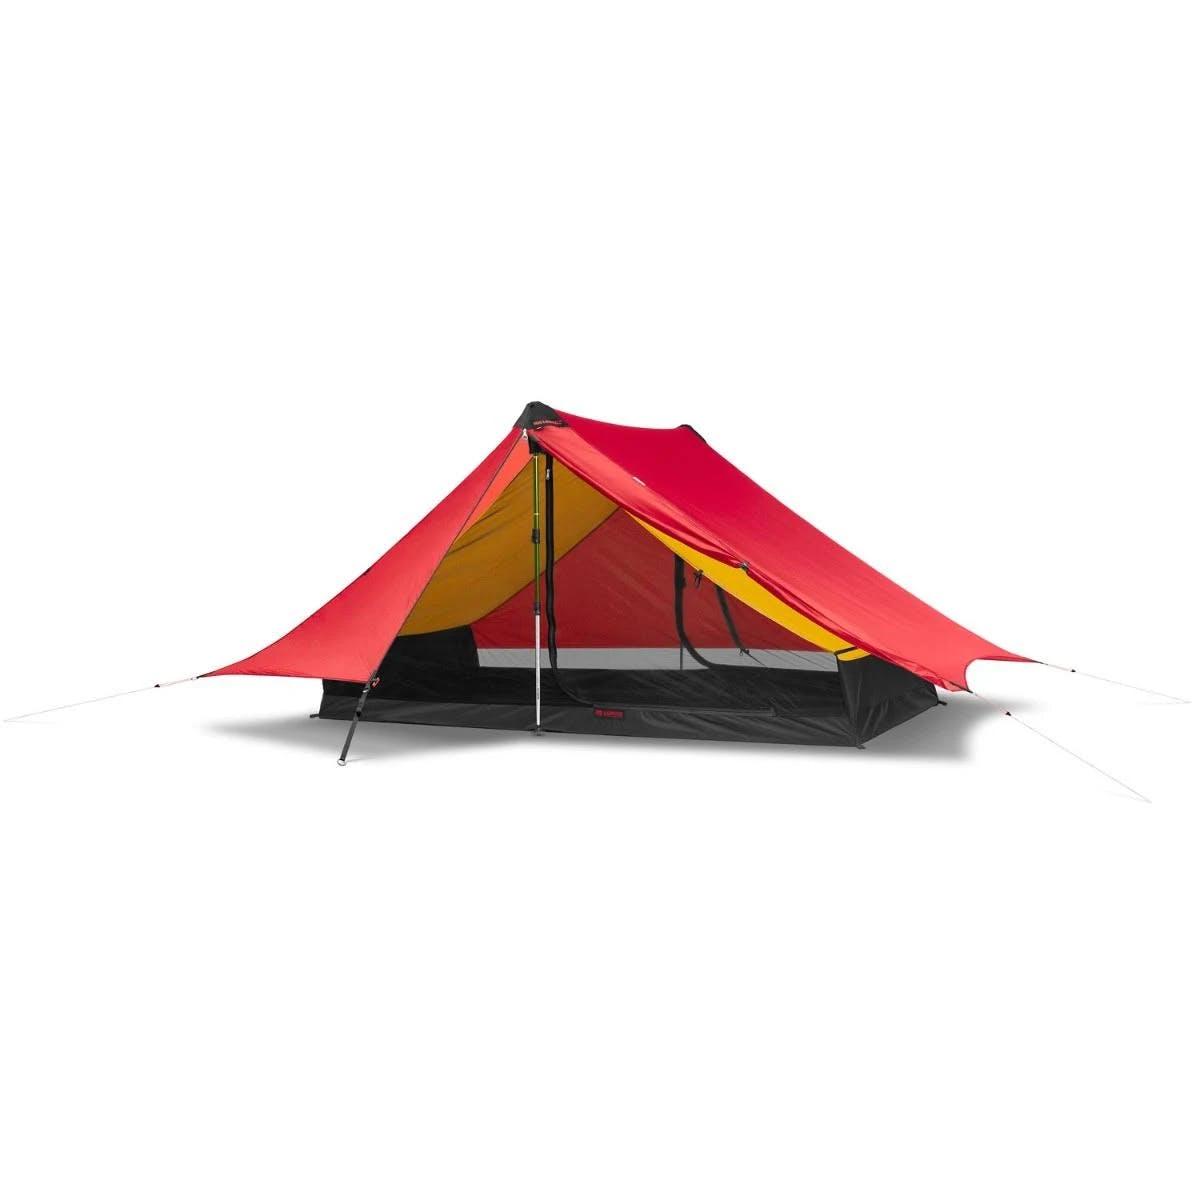 Hilleberg Anaris 2 Person Tent